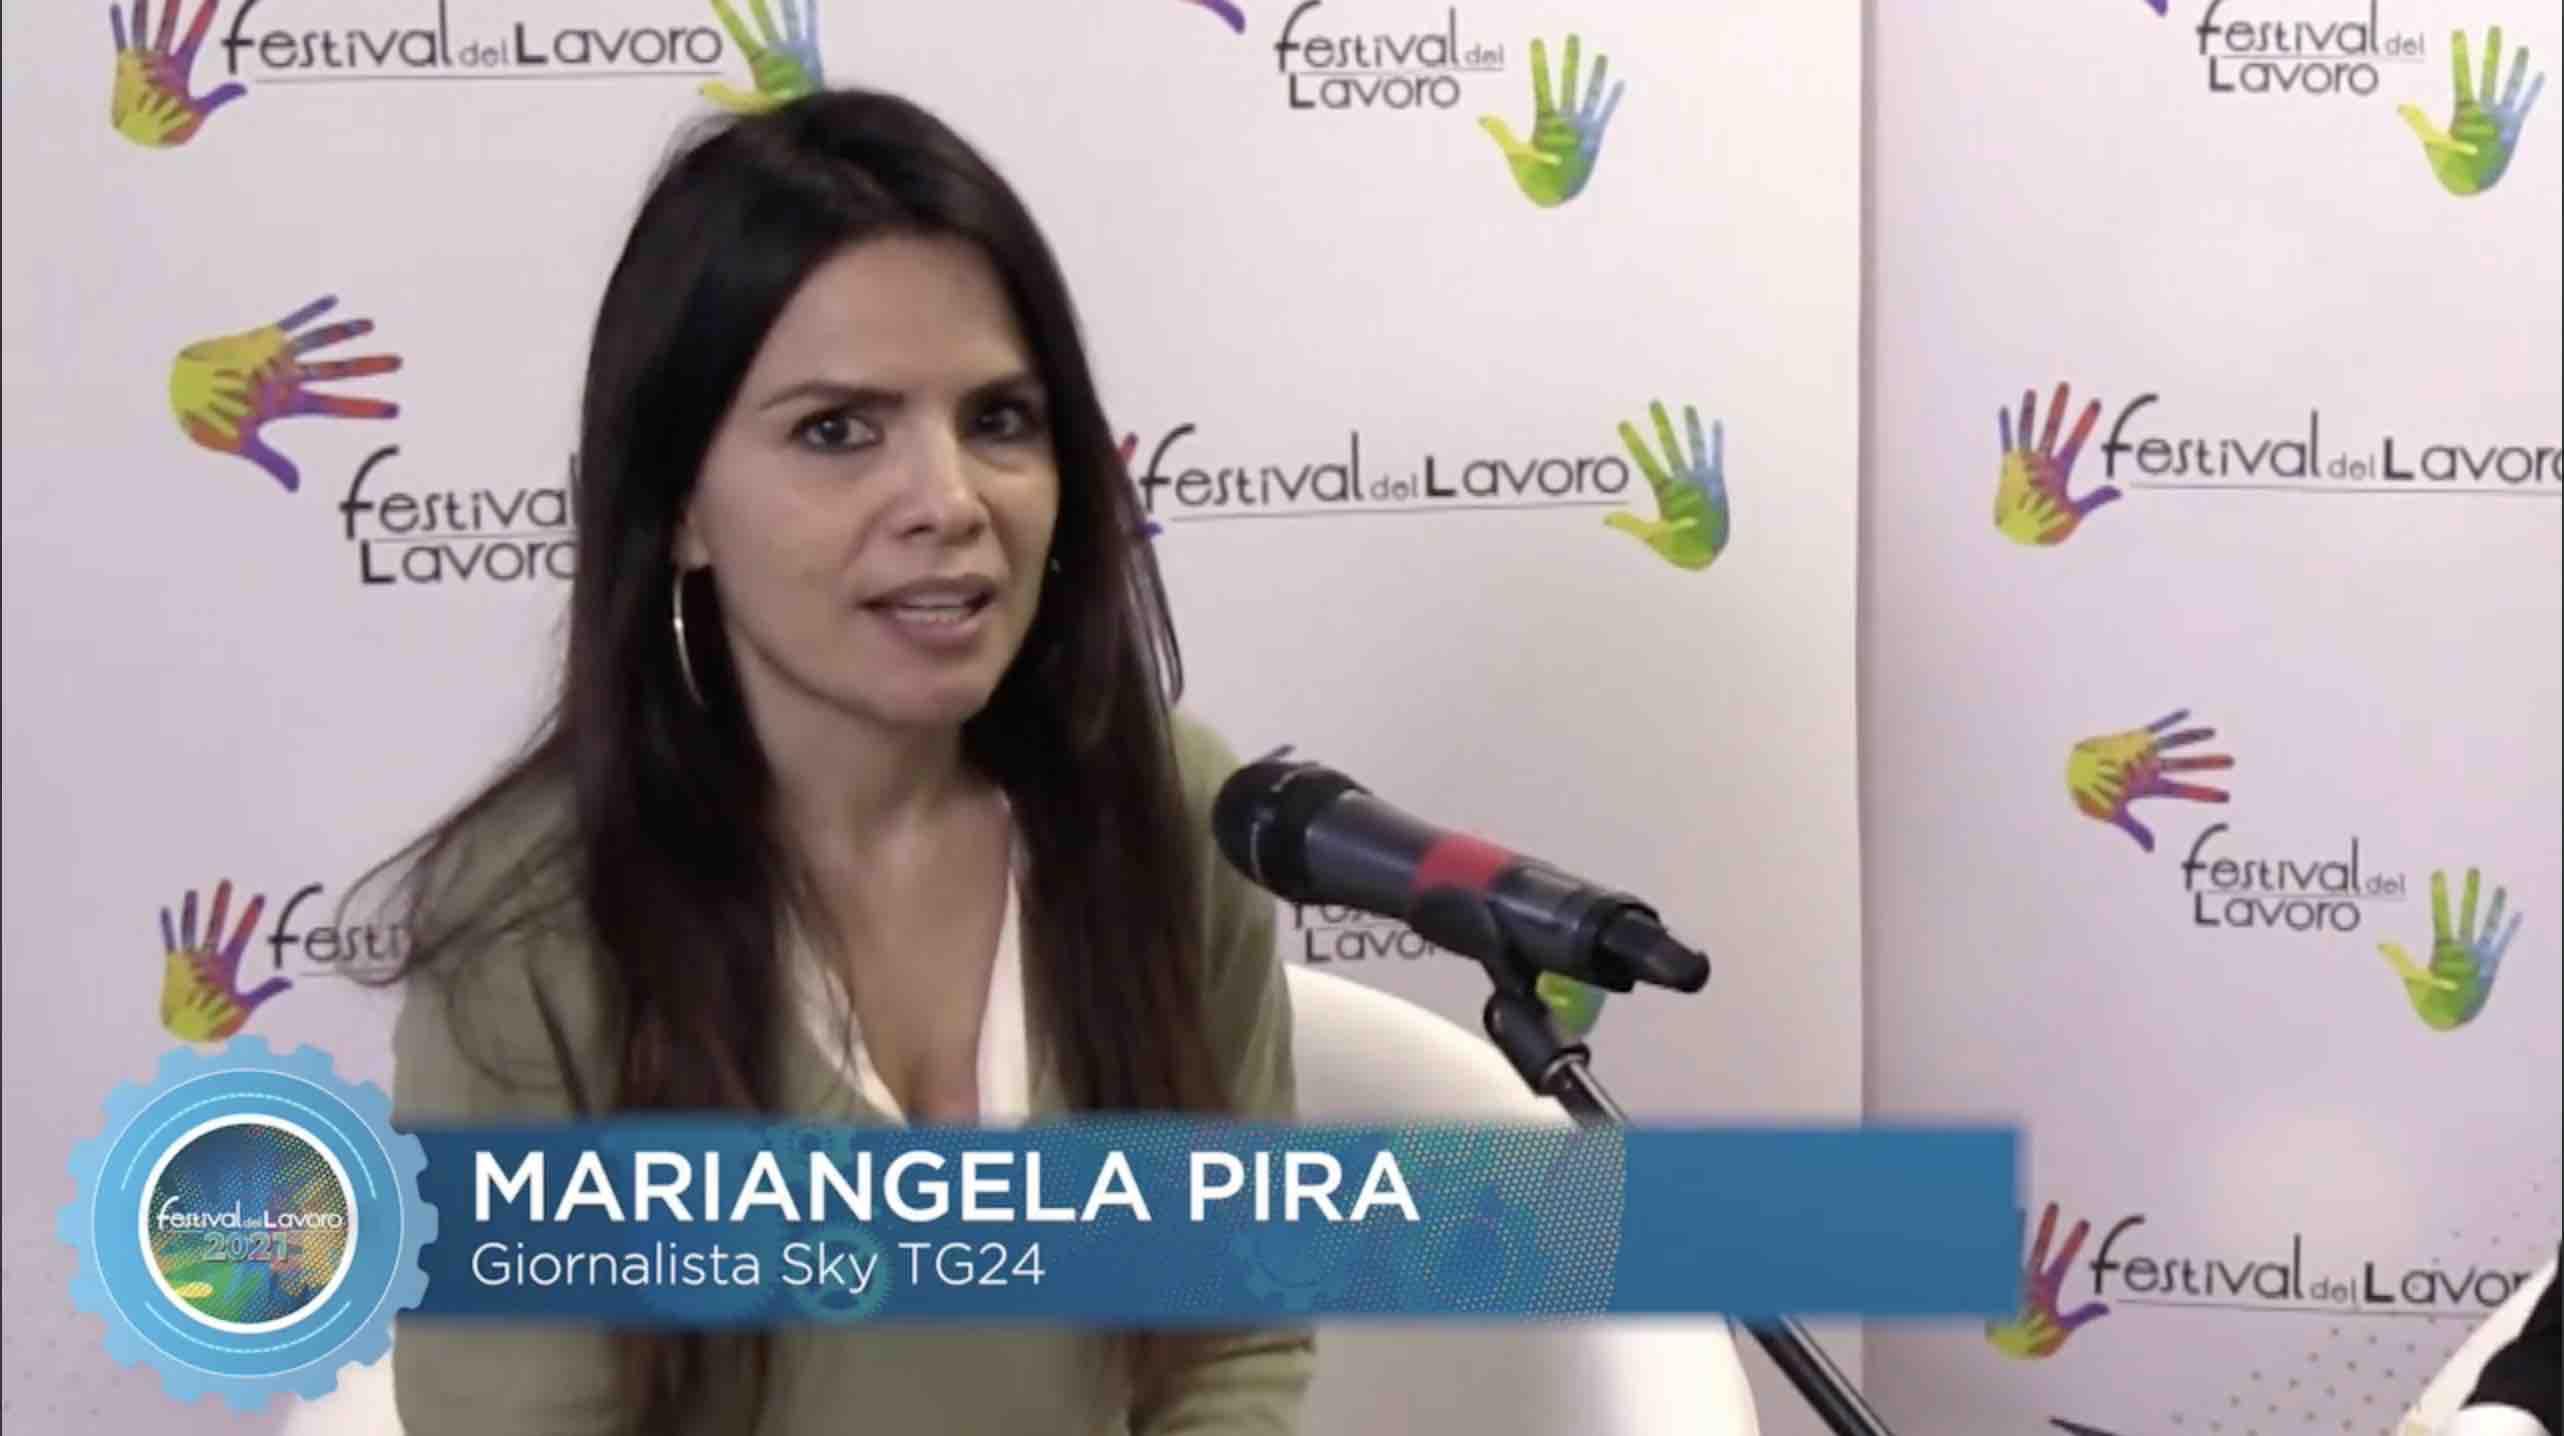 Intervista a Mariangela Pira, giornalista Sky Tg24